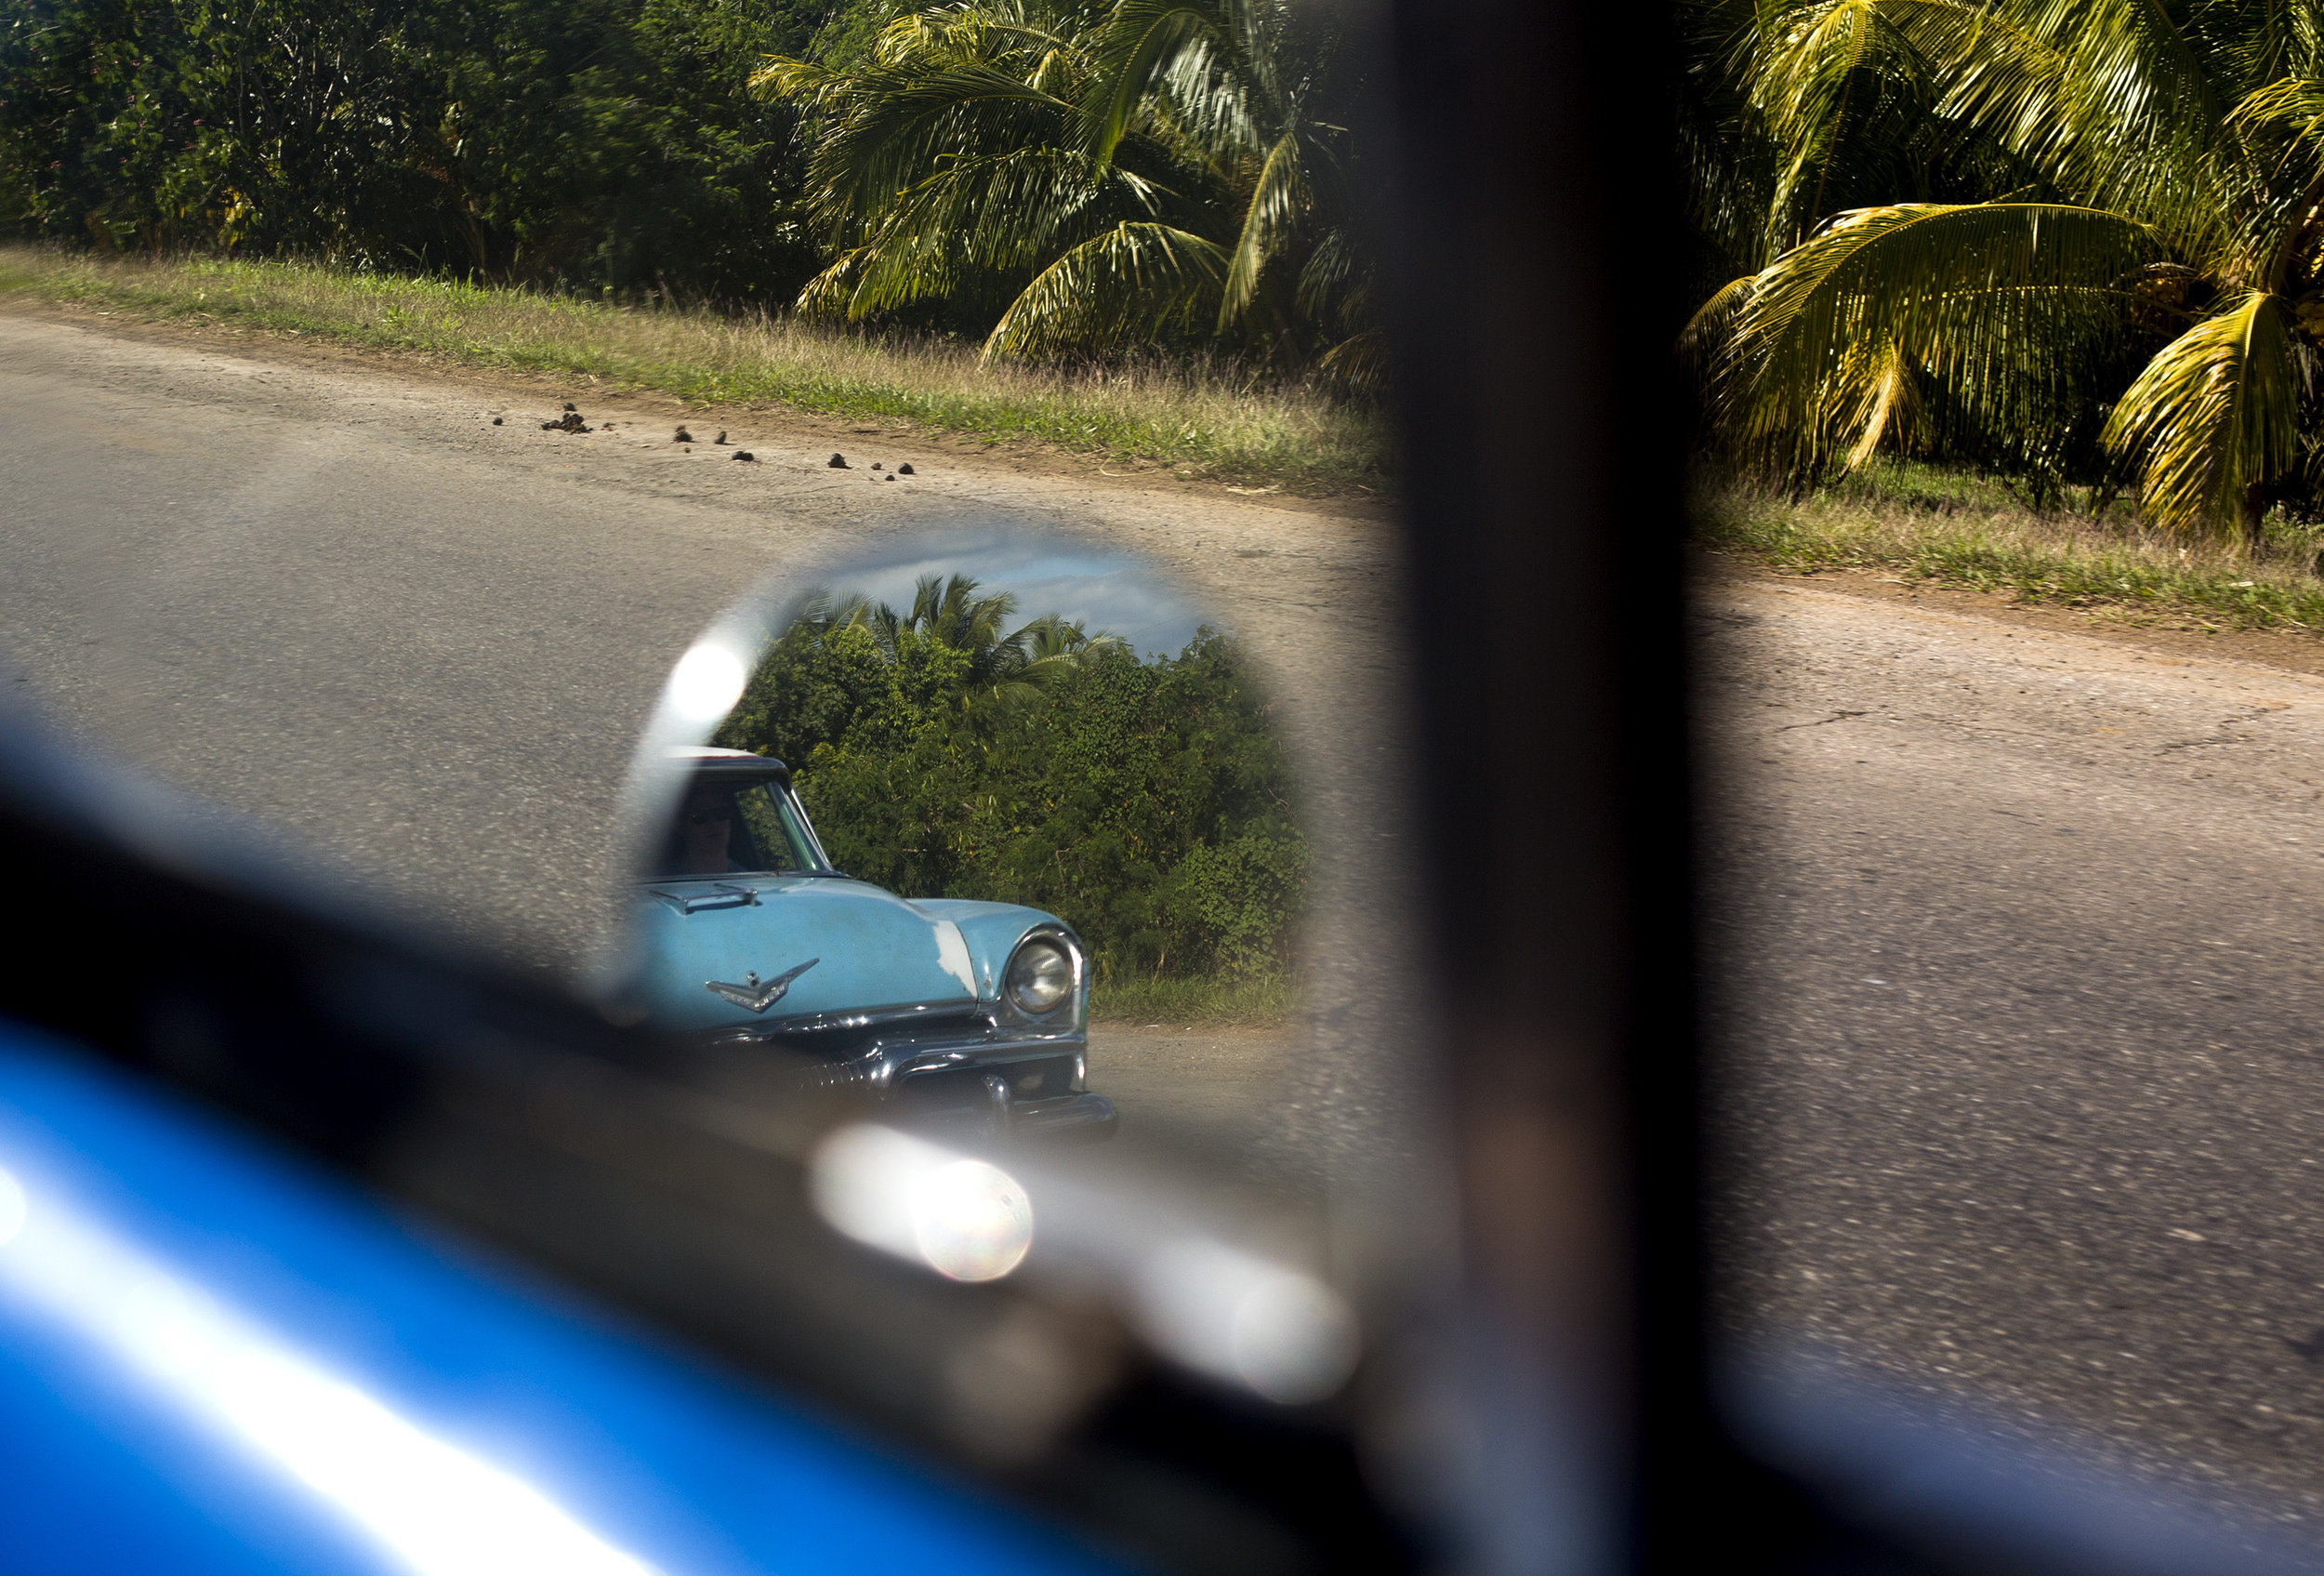 Between Havana and Viñales, Cuba.